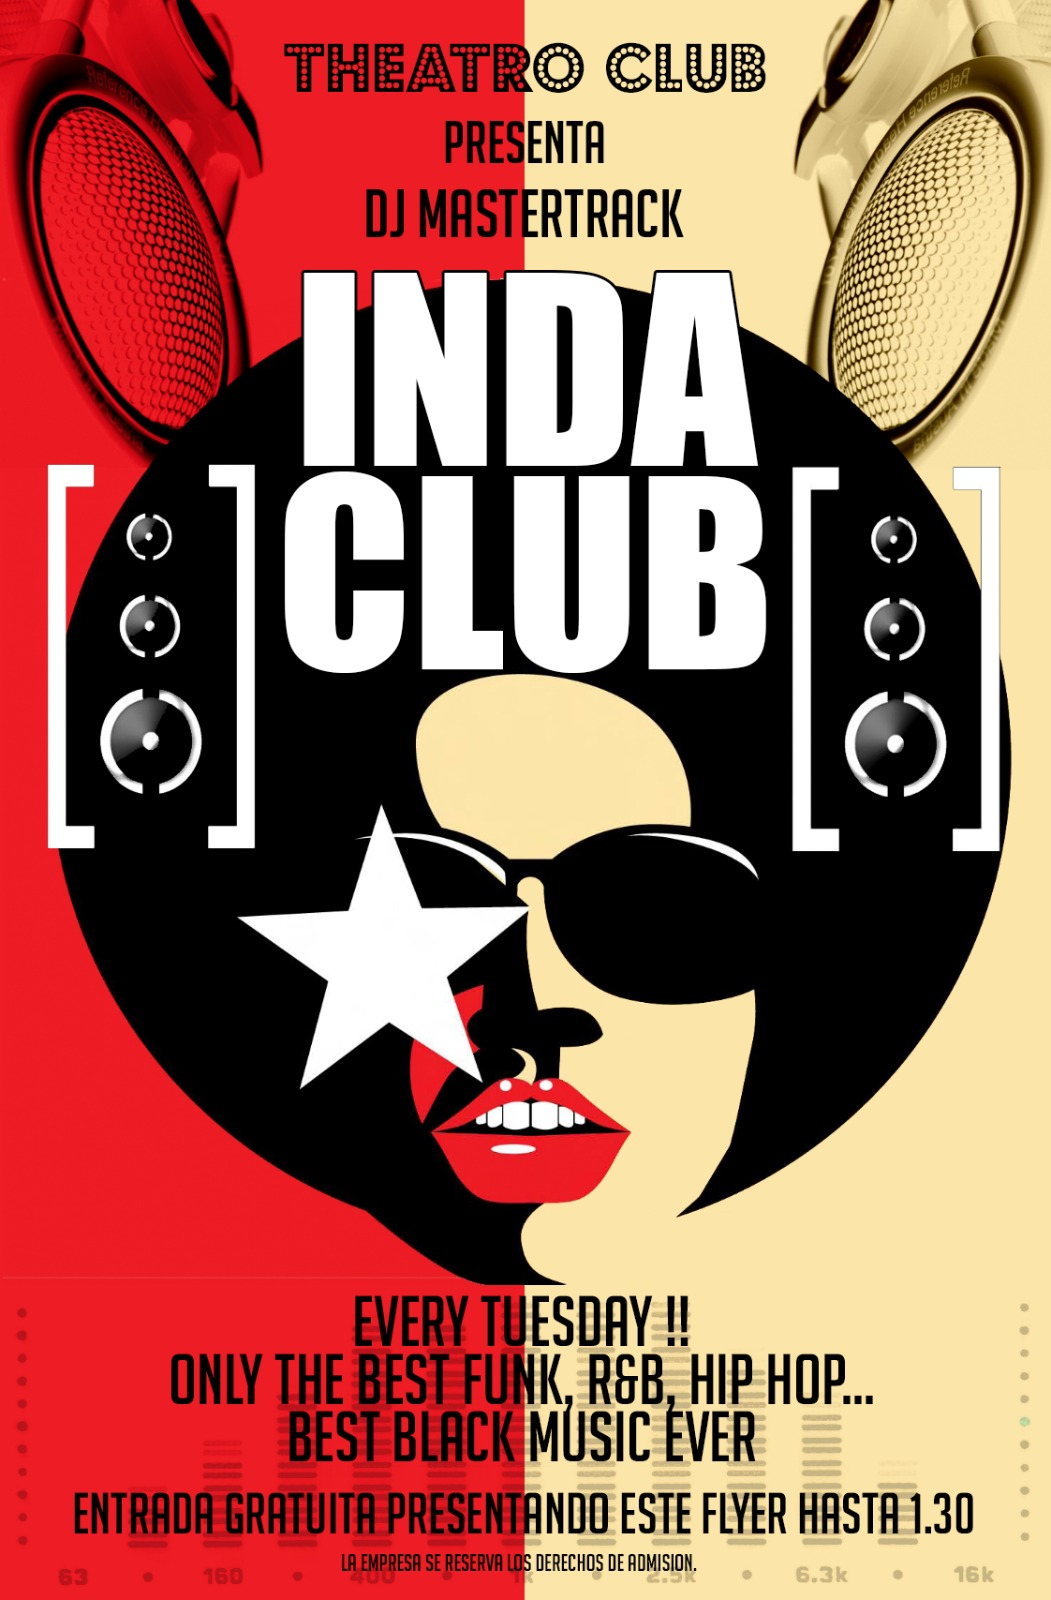 Inda Club at Theatro Club in Malaga